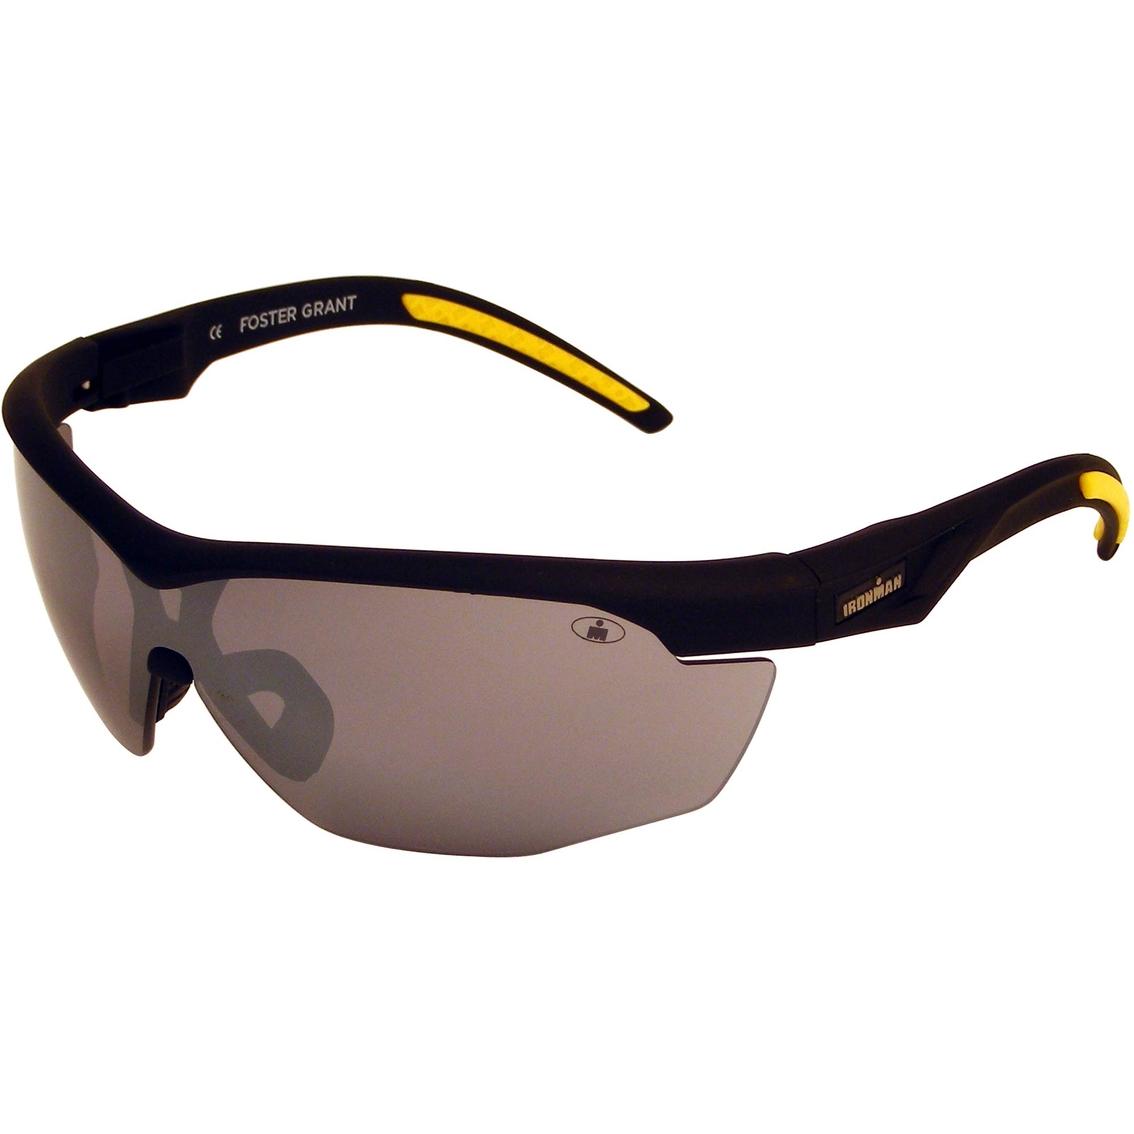 bc964b82cb Foster Grant Ironman Tenacity Sunglasses 10203838.fgx